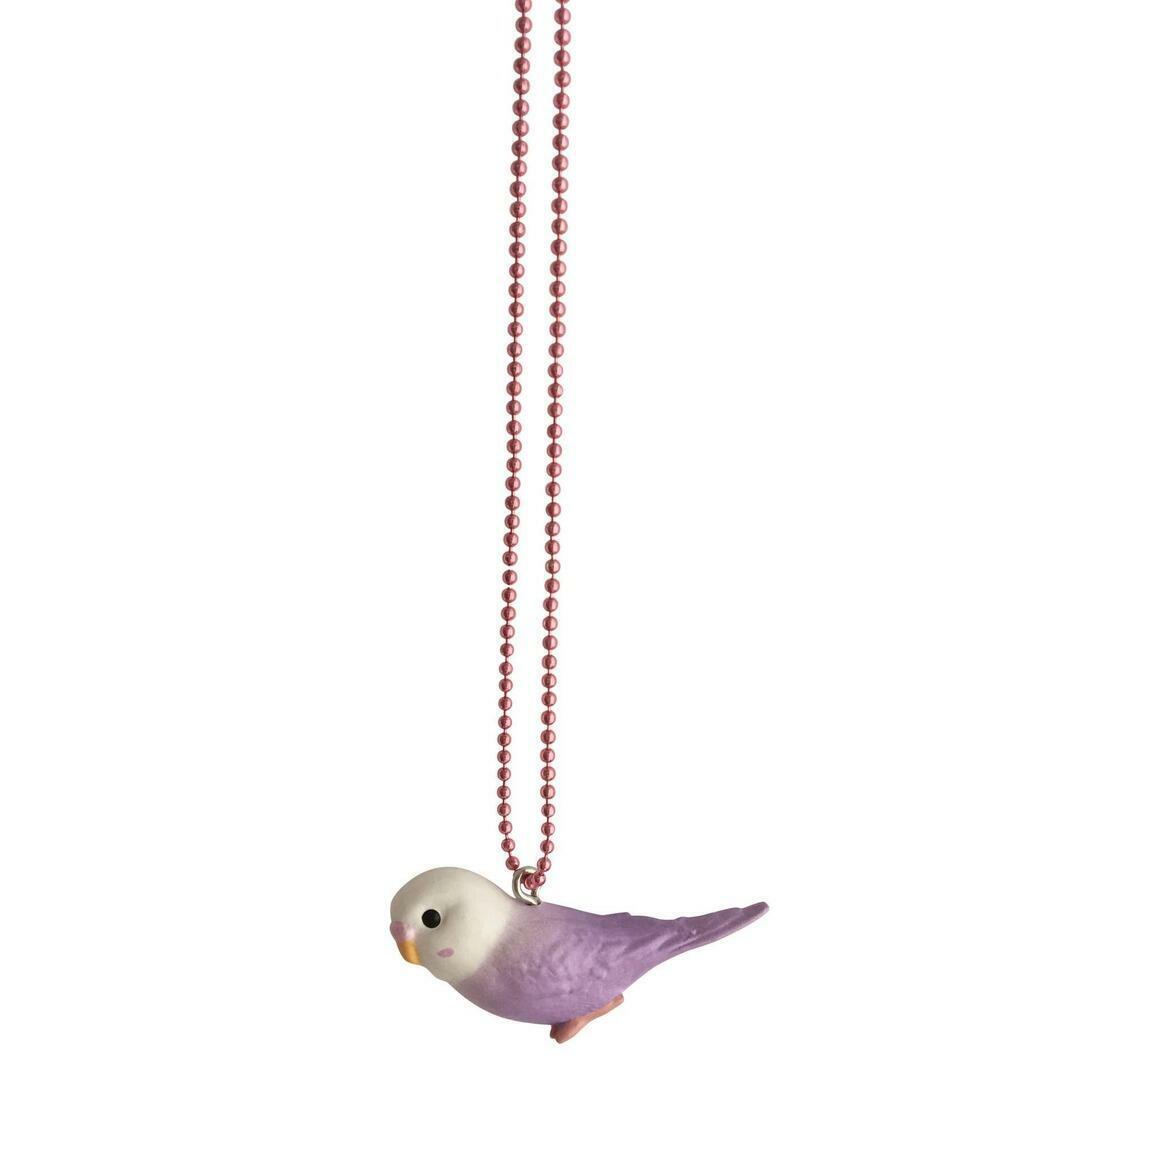 Ltd Pop Cutie Parakeet Necklaces -  mother's day | Trada Marketplace